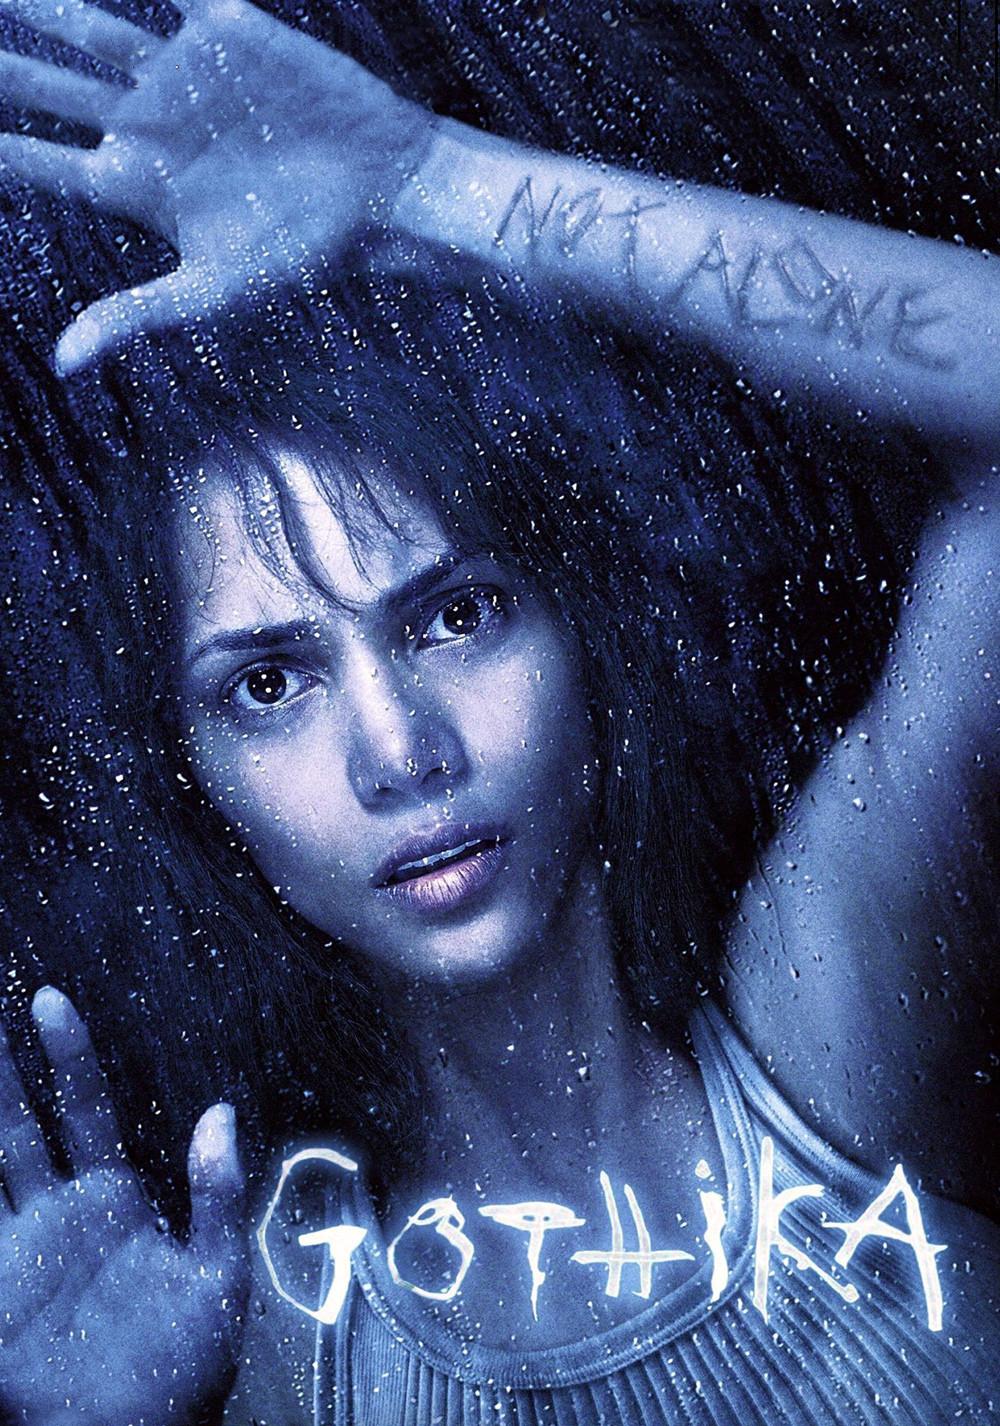 None Of Above >> Gothika   Movie fanart   fanart.tv